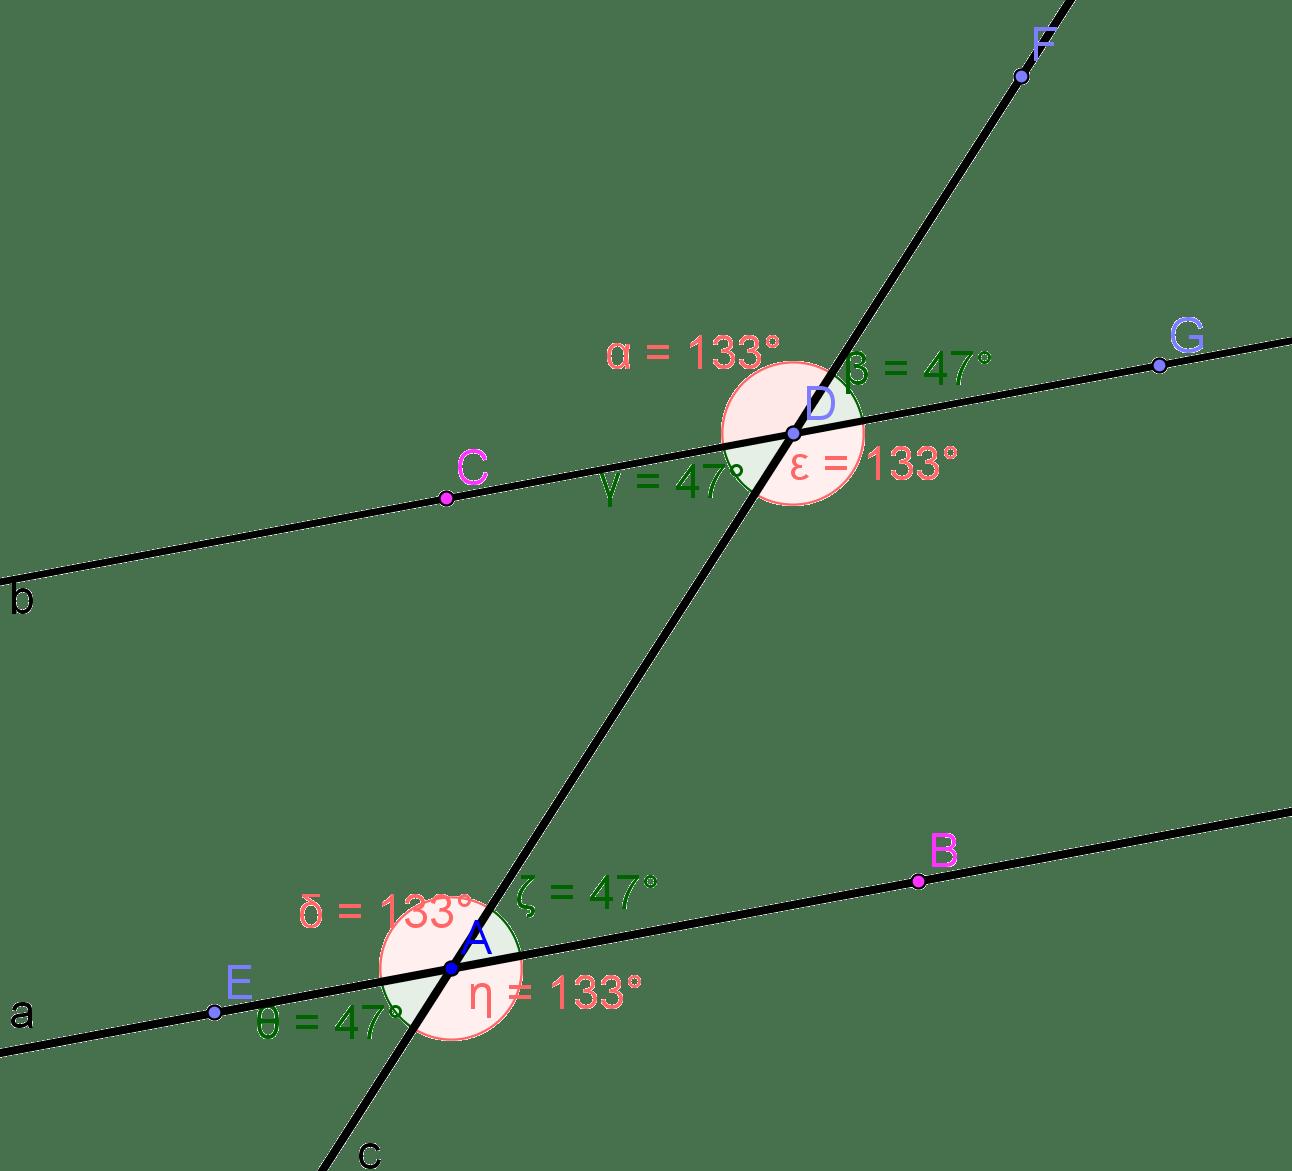 HighAIMS GeoGebra Workshop / Jennifer Murphy